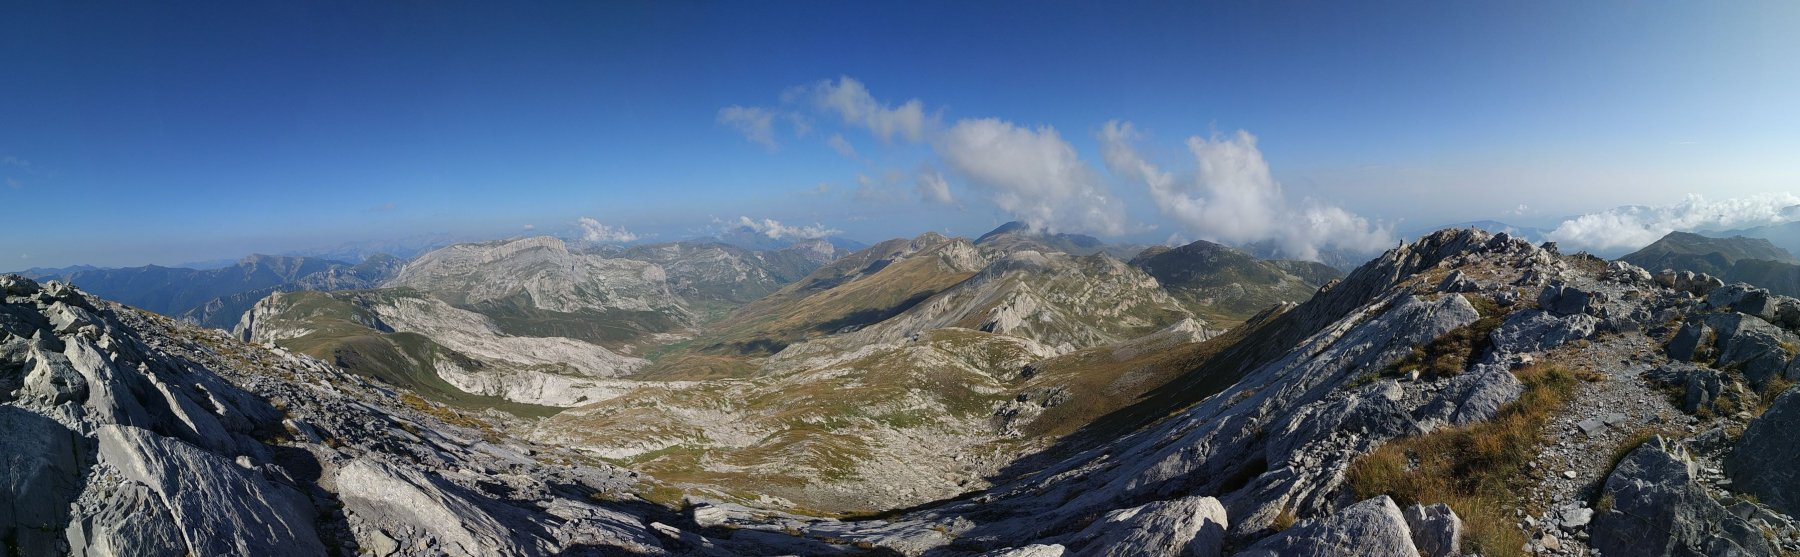 Panoramica verso il Piemonte